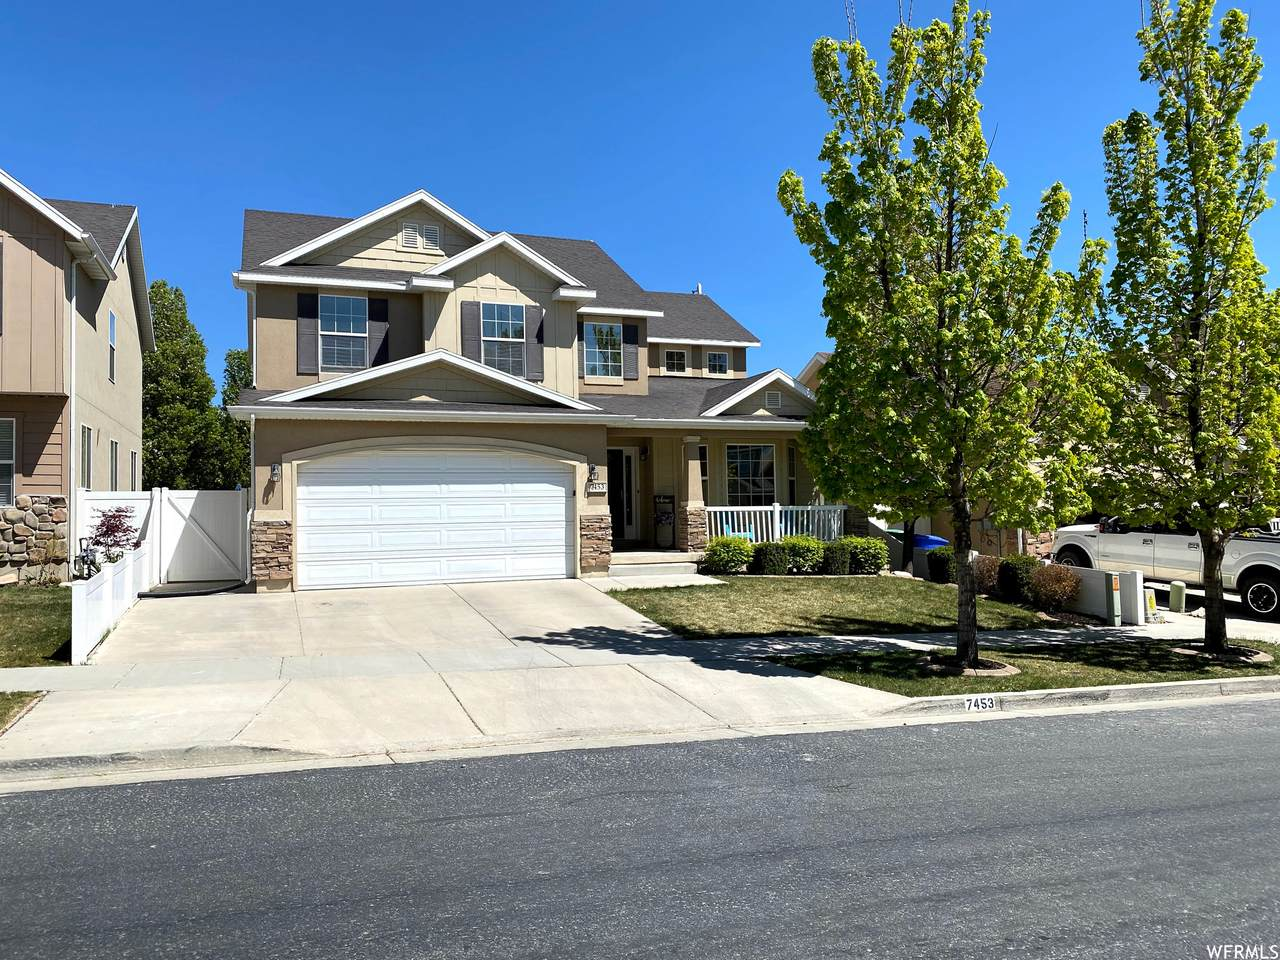 7453 Mesa Maple Dr - Photo 1